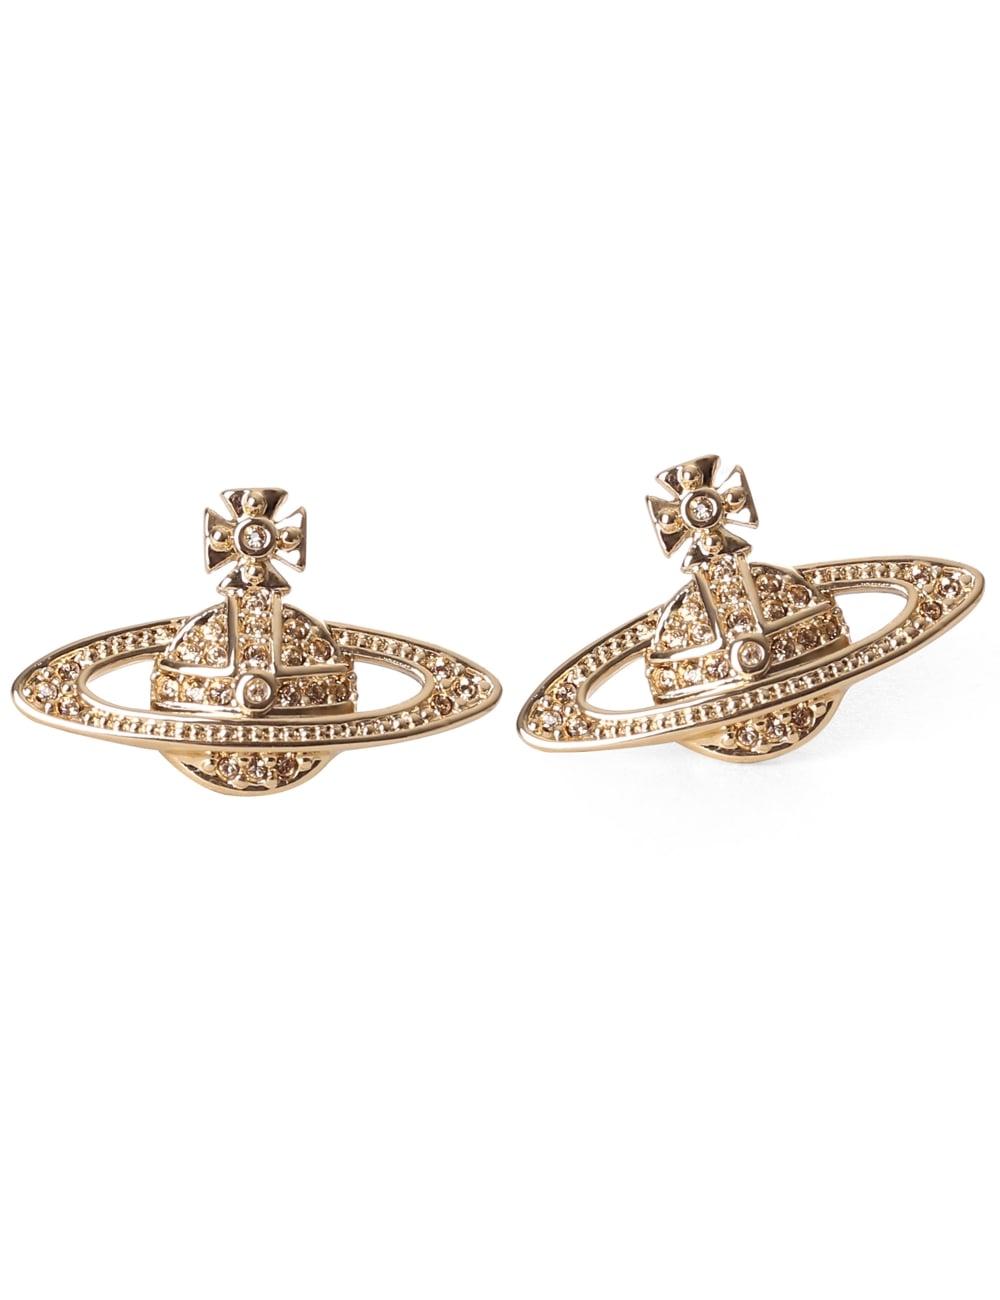 8ed1eb8a745 Vivienne Westwood Mini Bas Relief Earrings